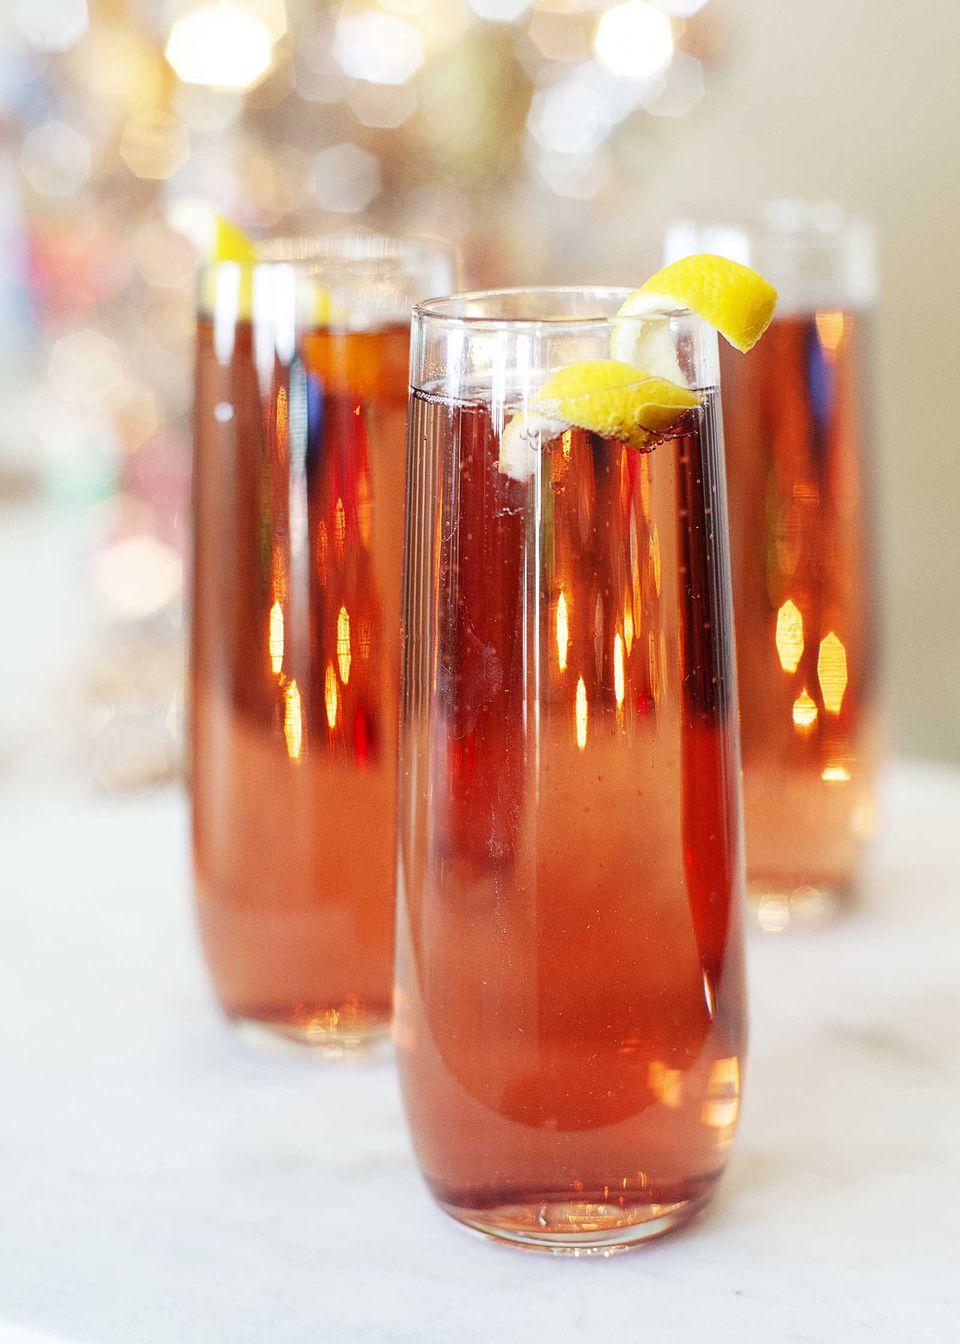 Raspberry liqueur cocktail with lemon peel